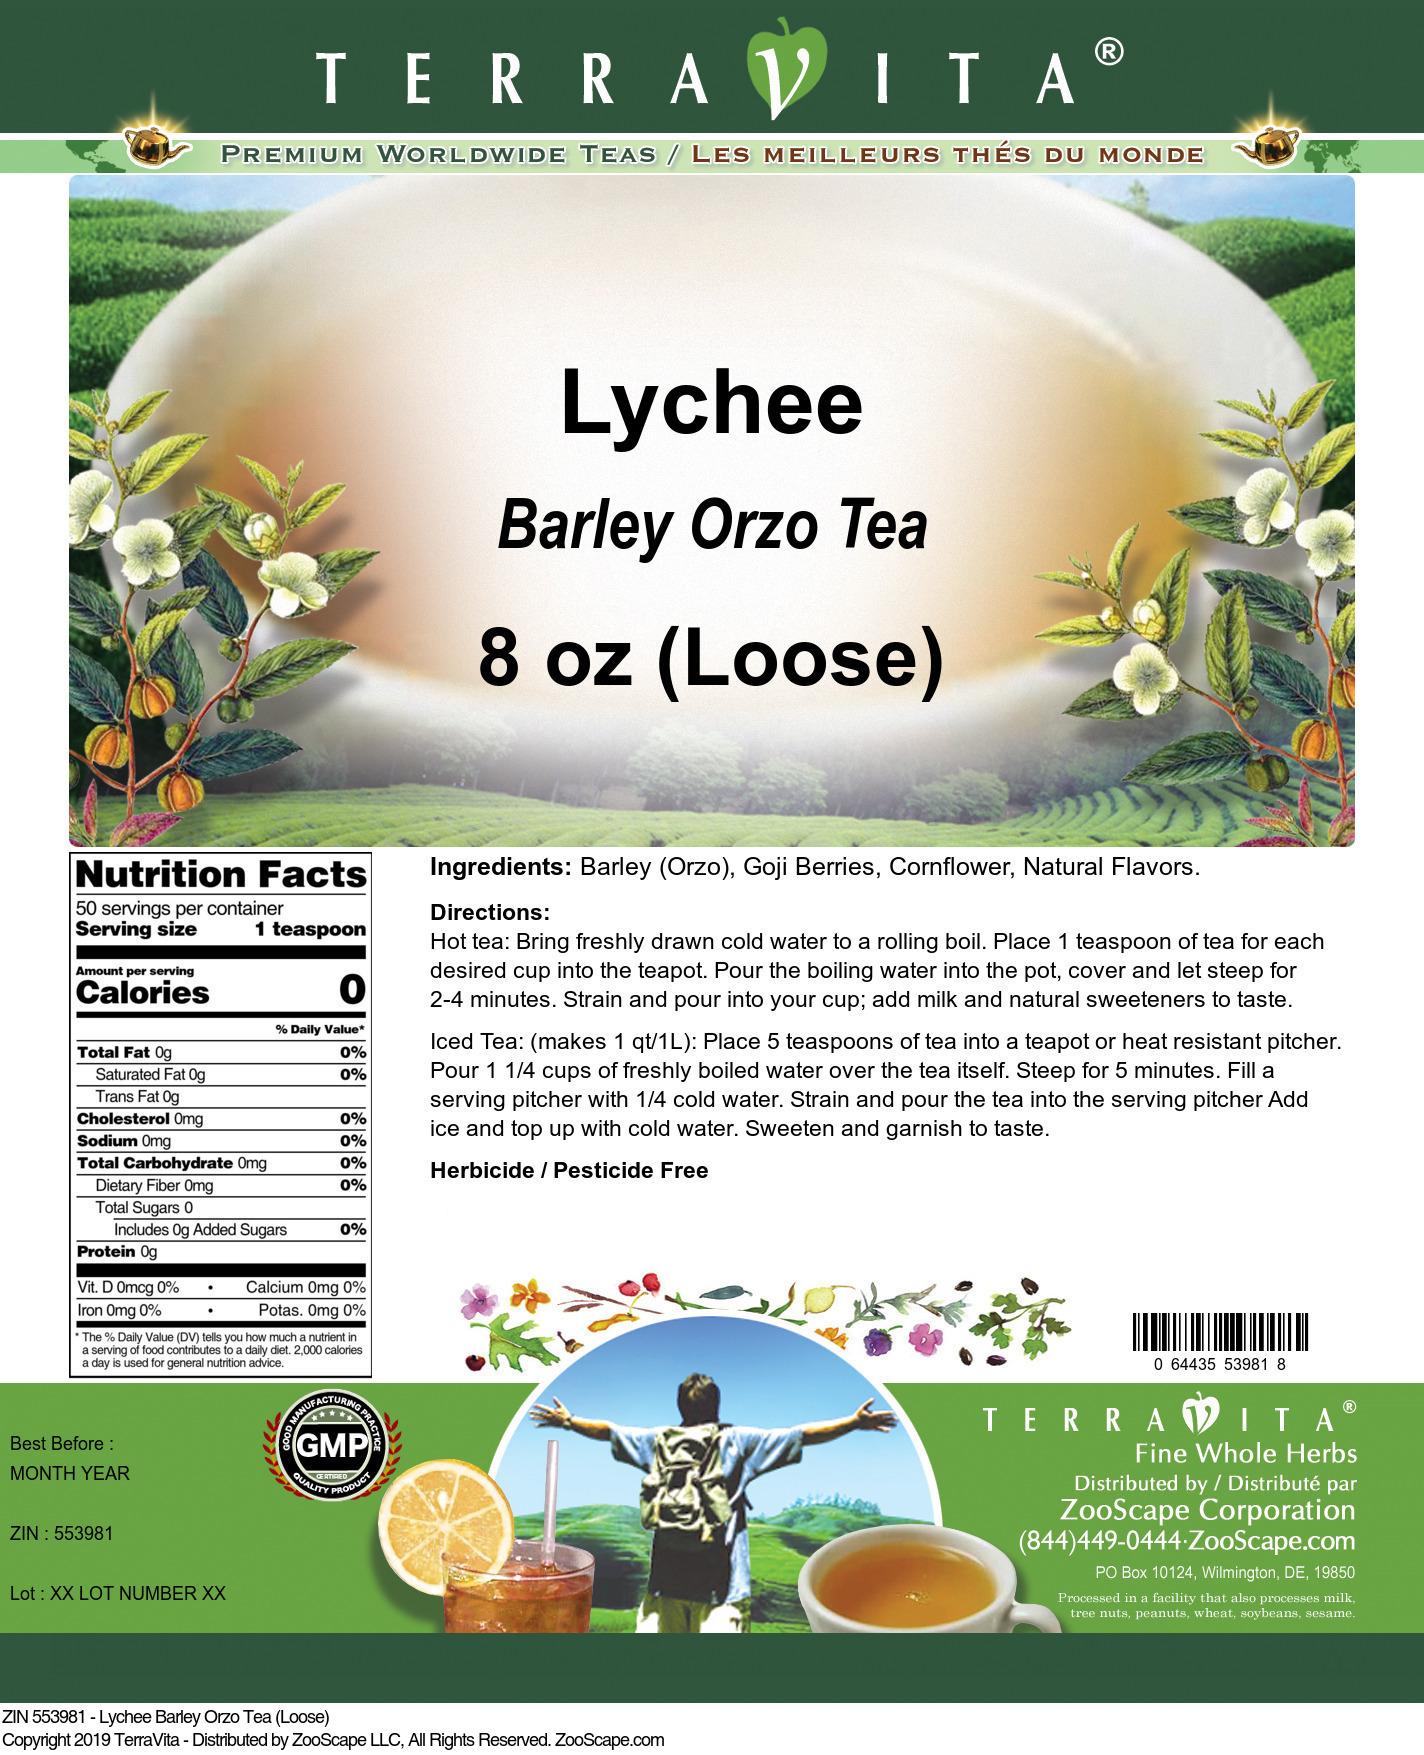 Lychee Barley Orzo